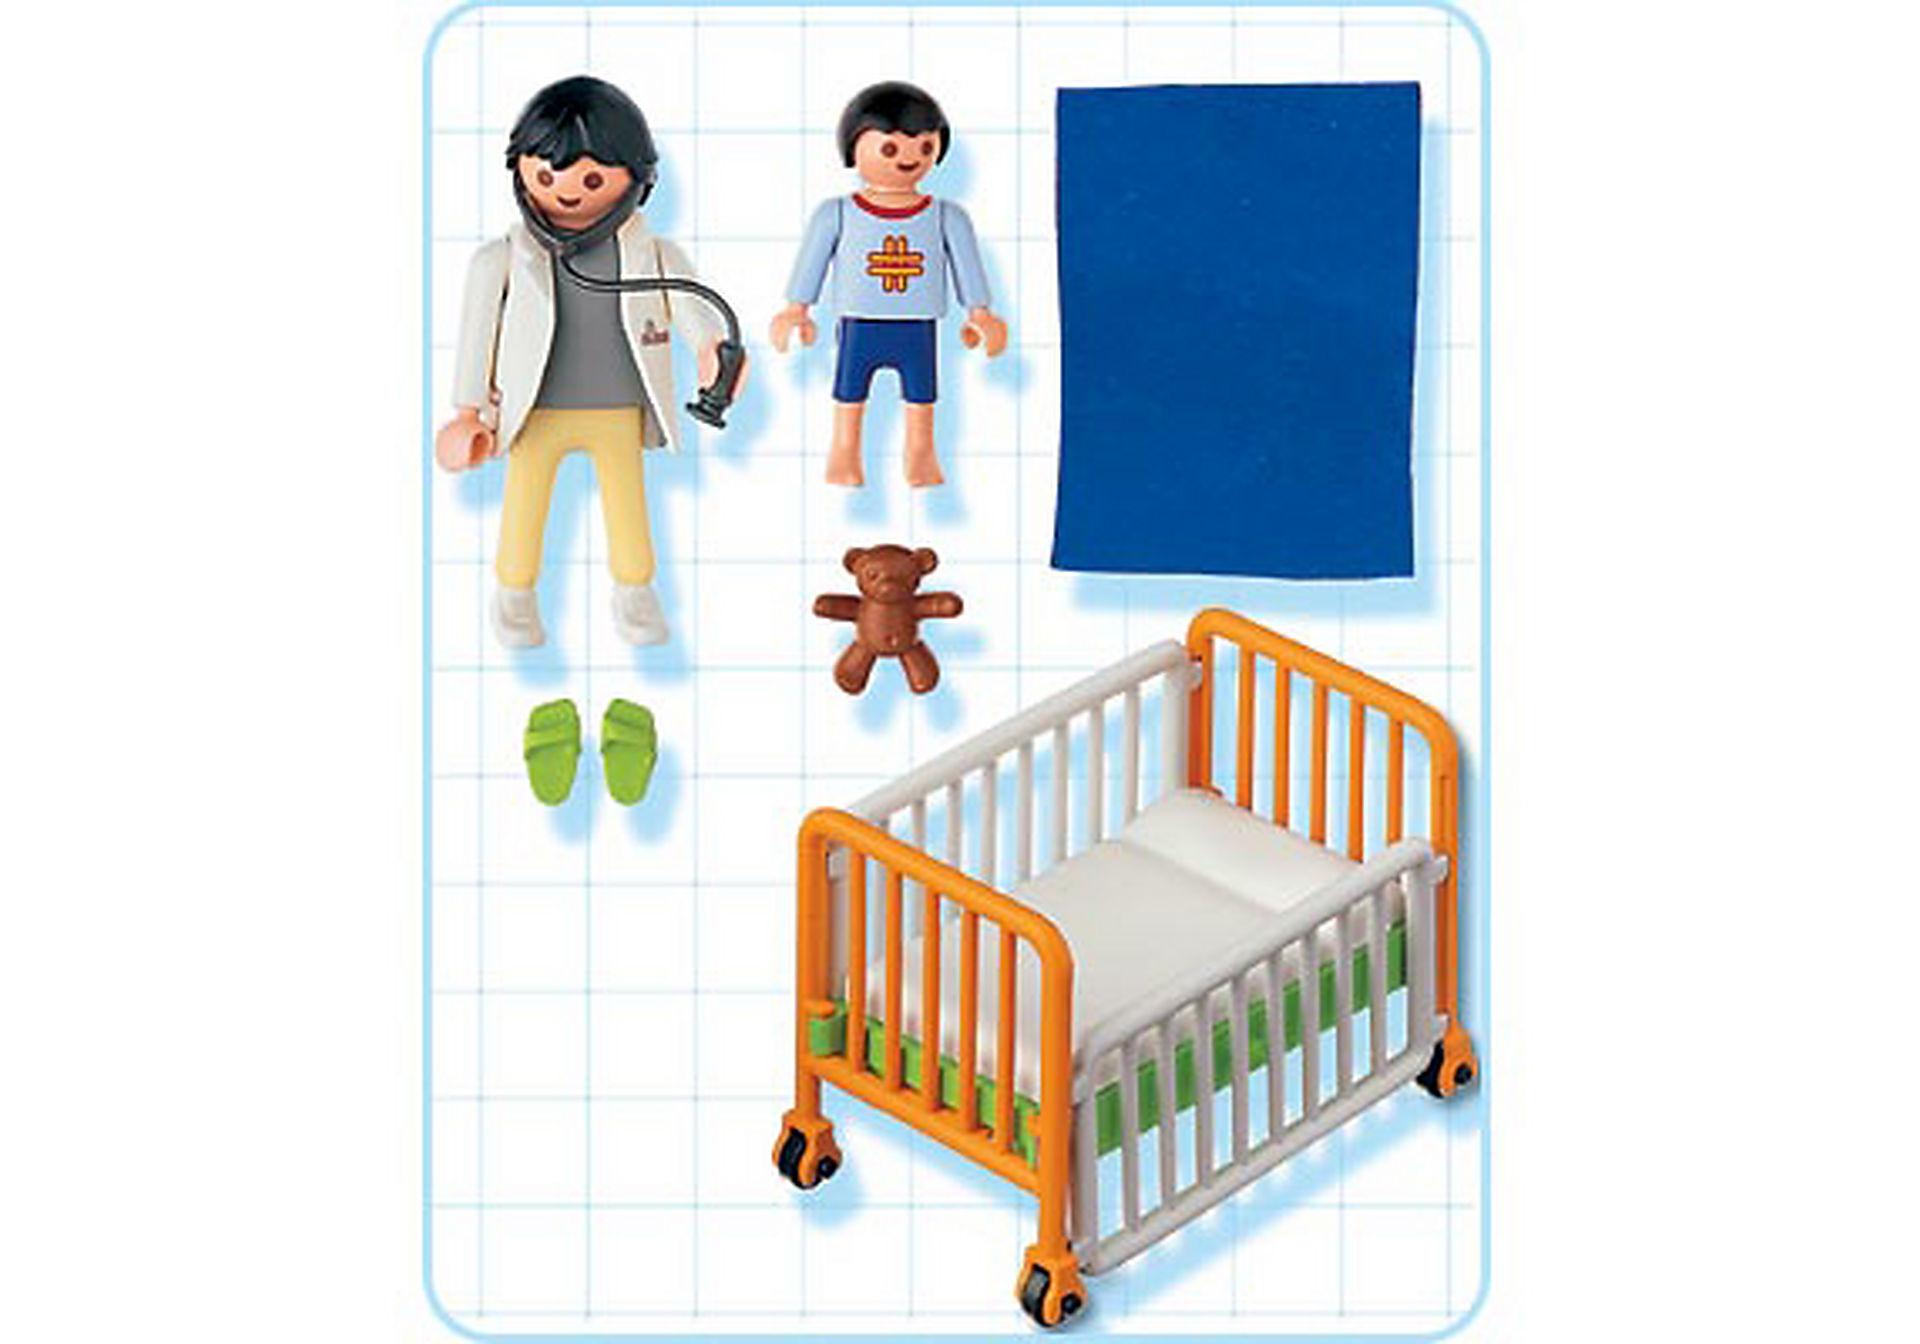 4406-A Médecin / enfant / lit d'hôpital zoom image2